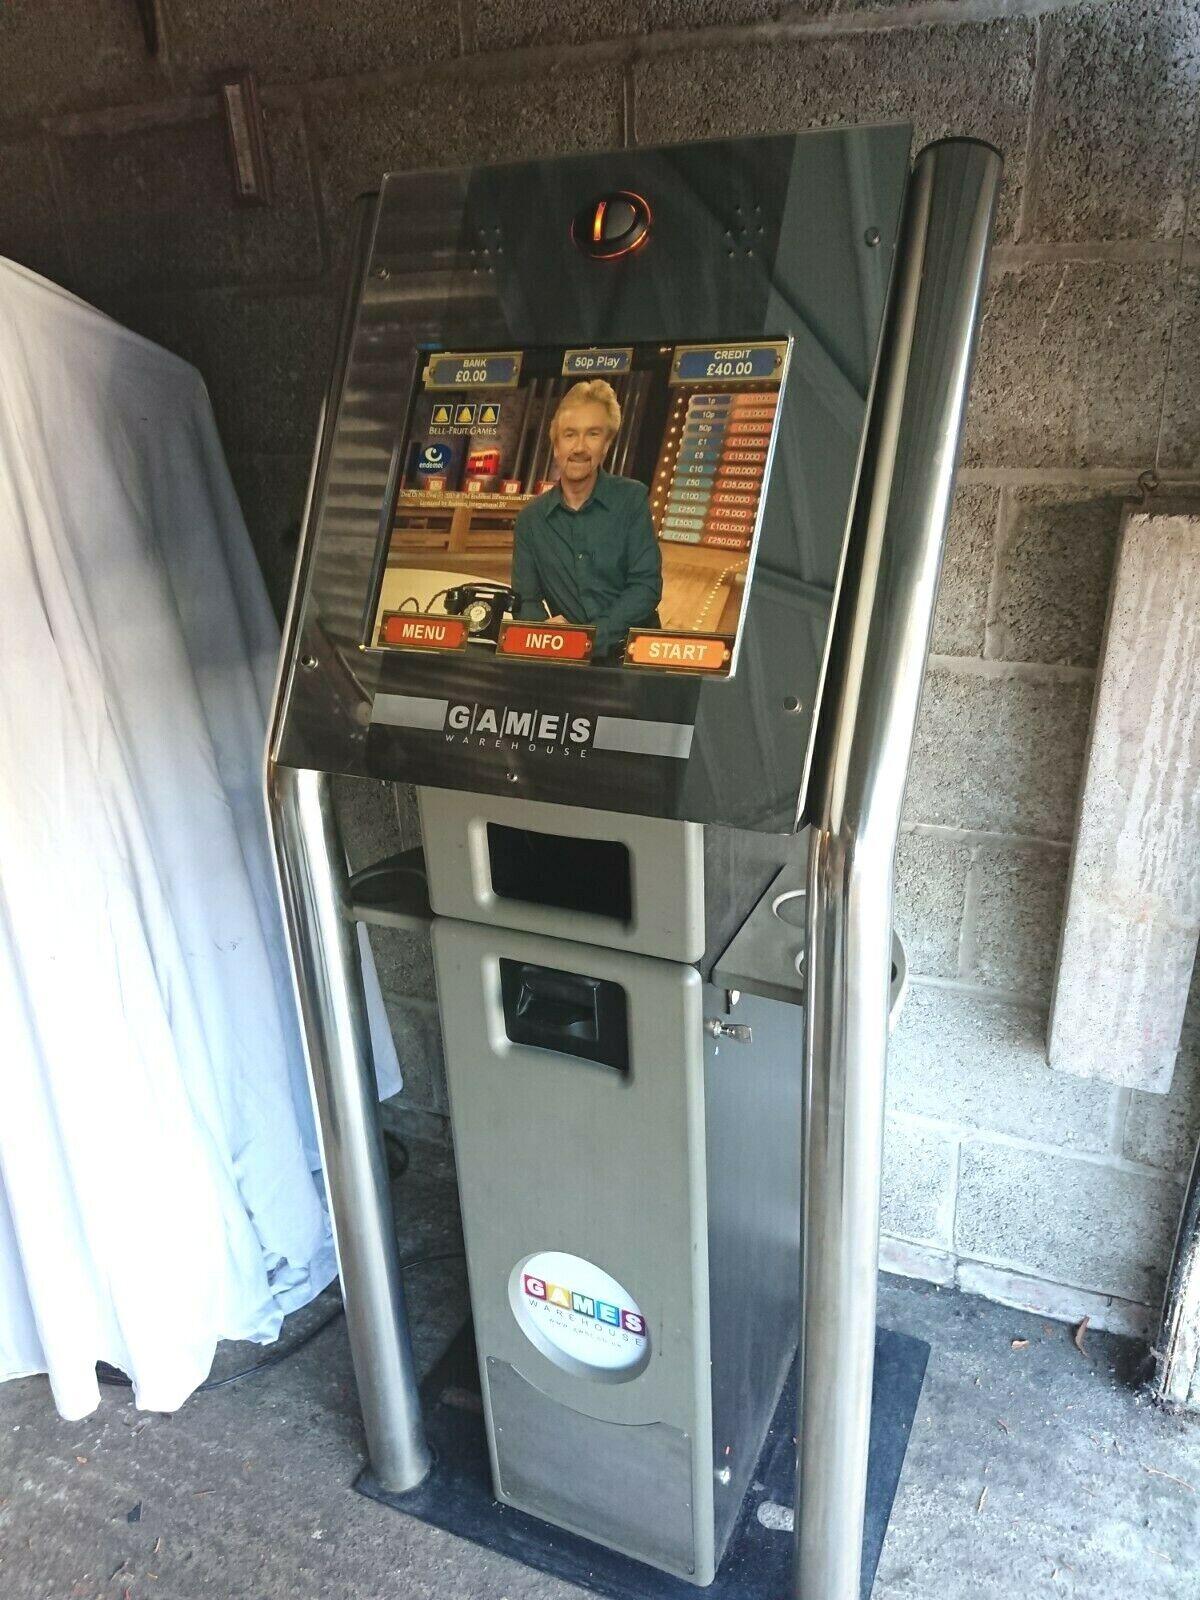 Pub Quiz Machine now on free play Monopoly, Skill Ball Bingo, Millionaire etc